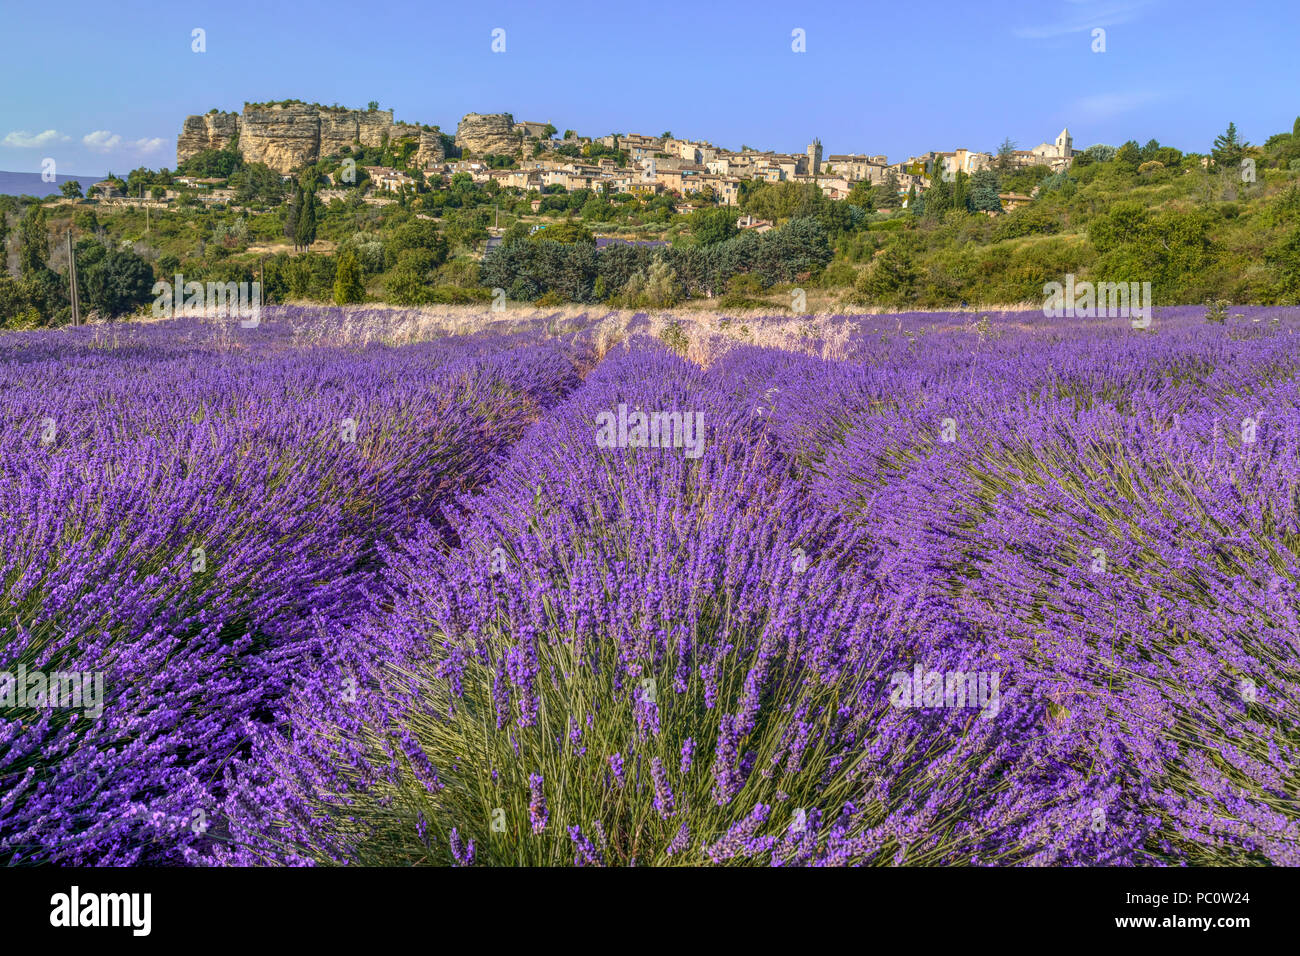 Saignon, Vaucluse; Provence, France, Europe - Stock Image